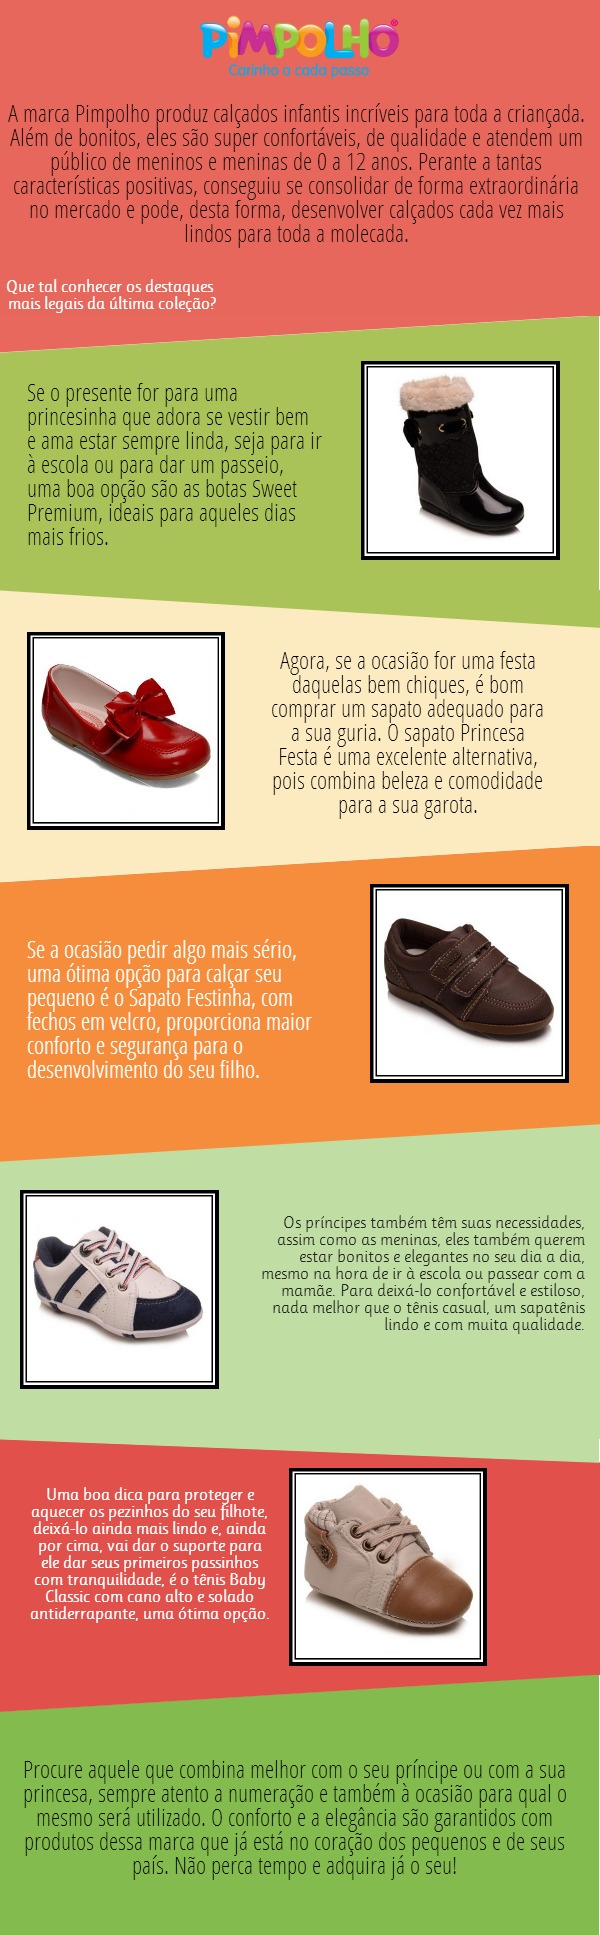 http://www.tricae.com.br/pimpolho